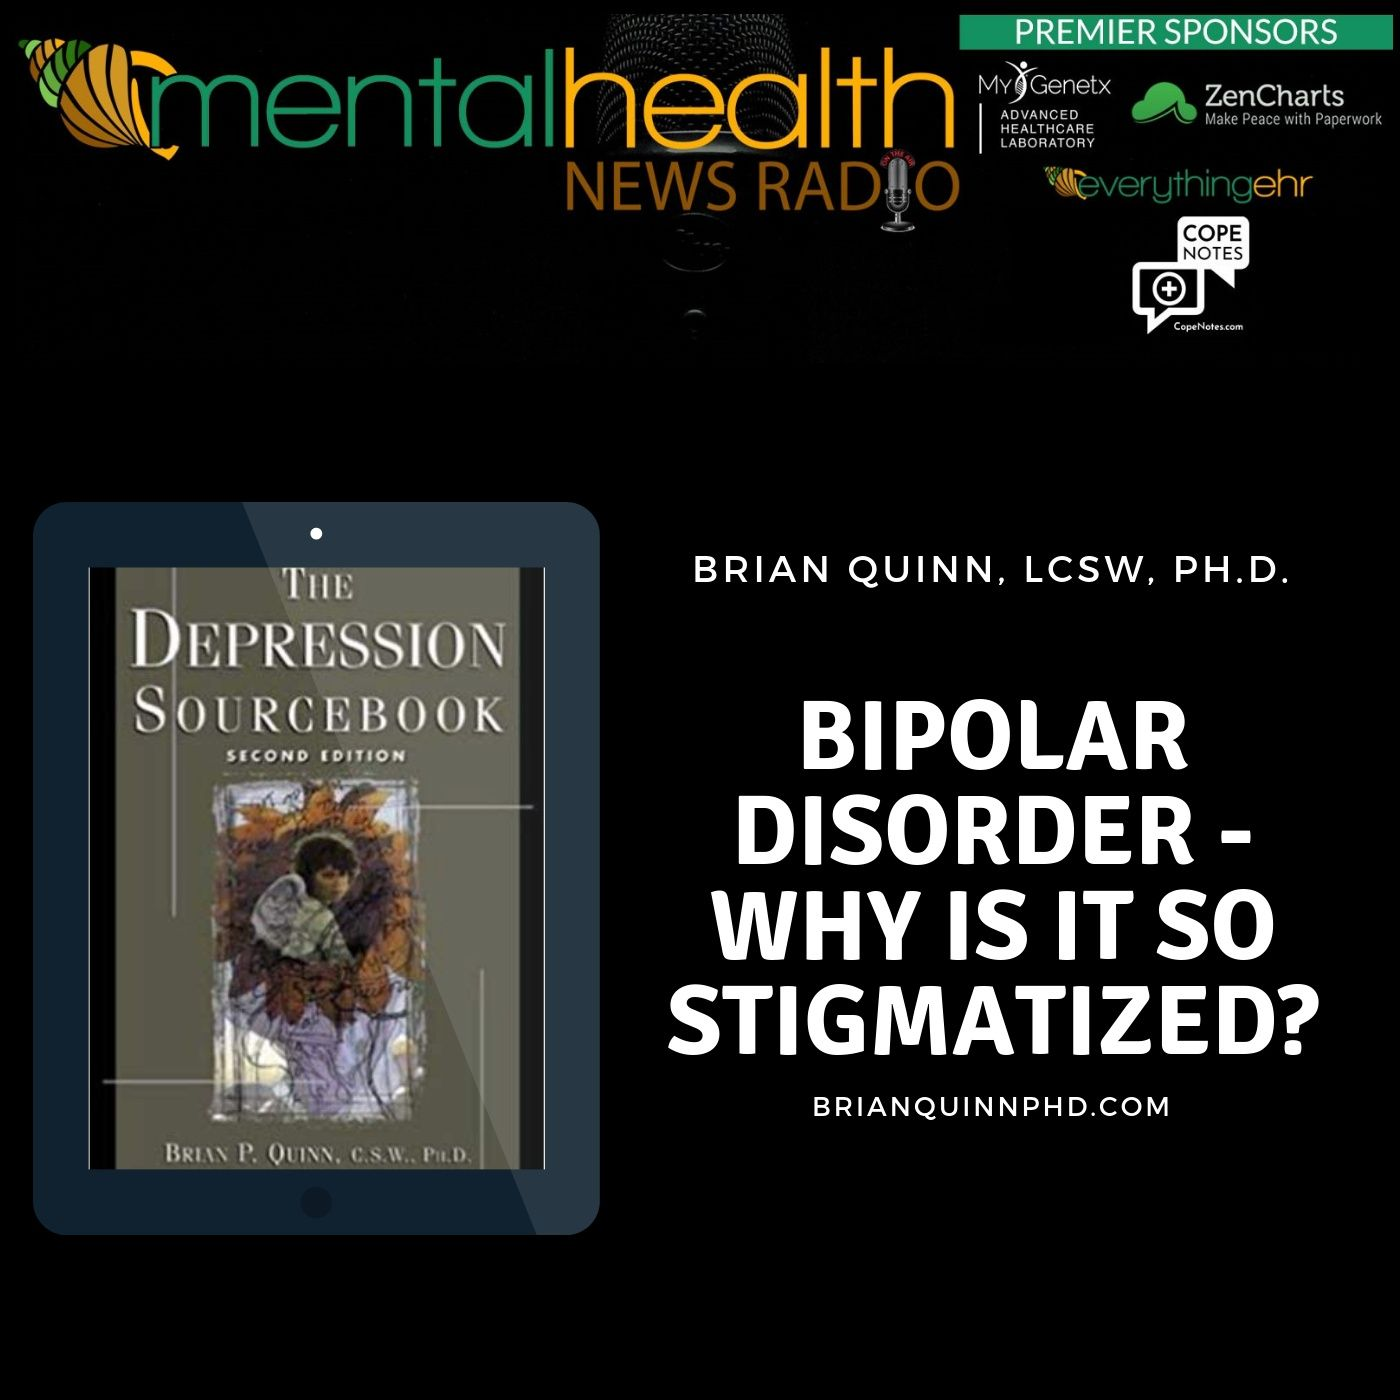 Mental Health News Radio - Bipolar Disorder - Why is it so Stigmatized with Dr. Brian Quinn